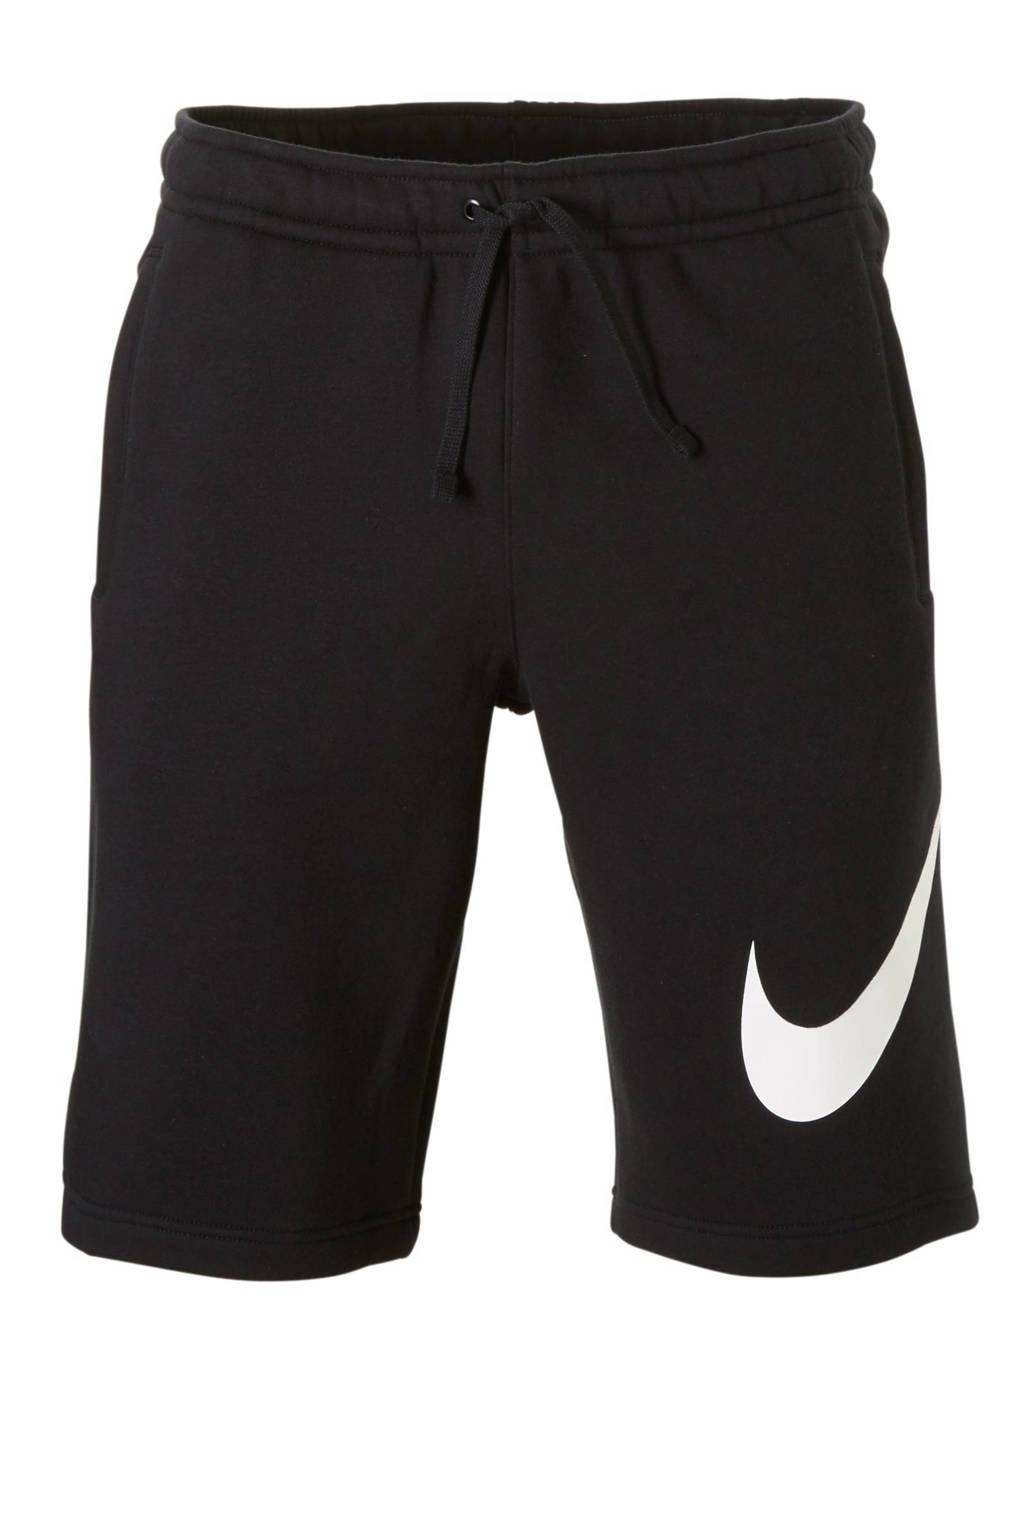 Nike   sweatshort zwart, Zwart